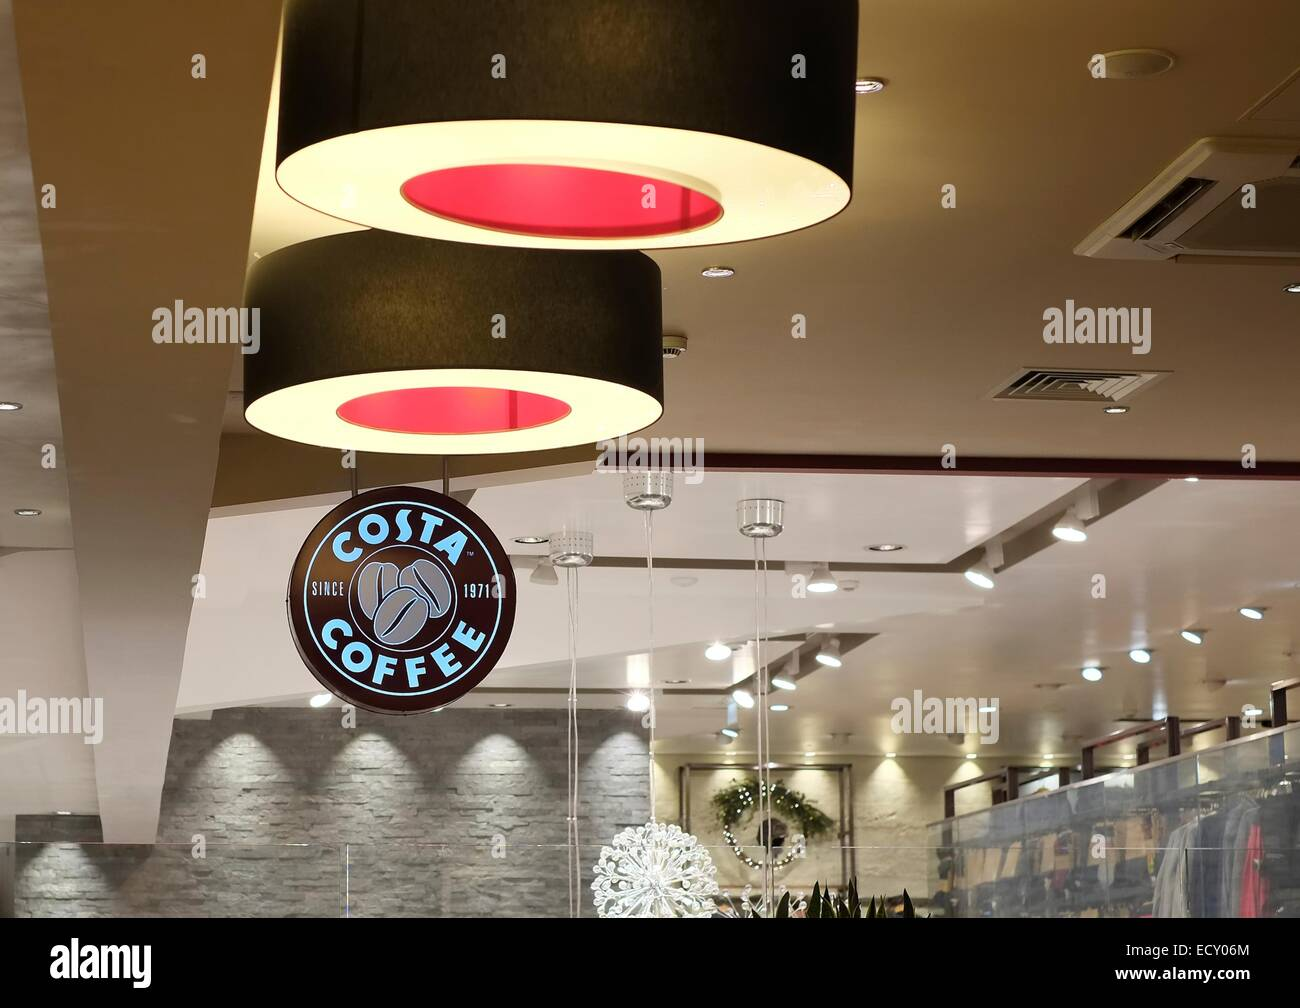 Costa Coffee Shop Interior Building Decor Stock Photo